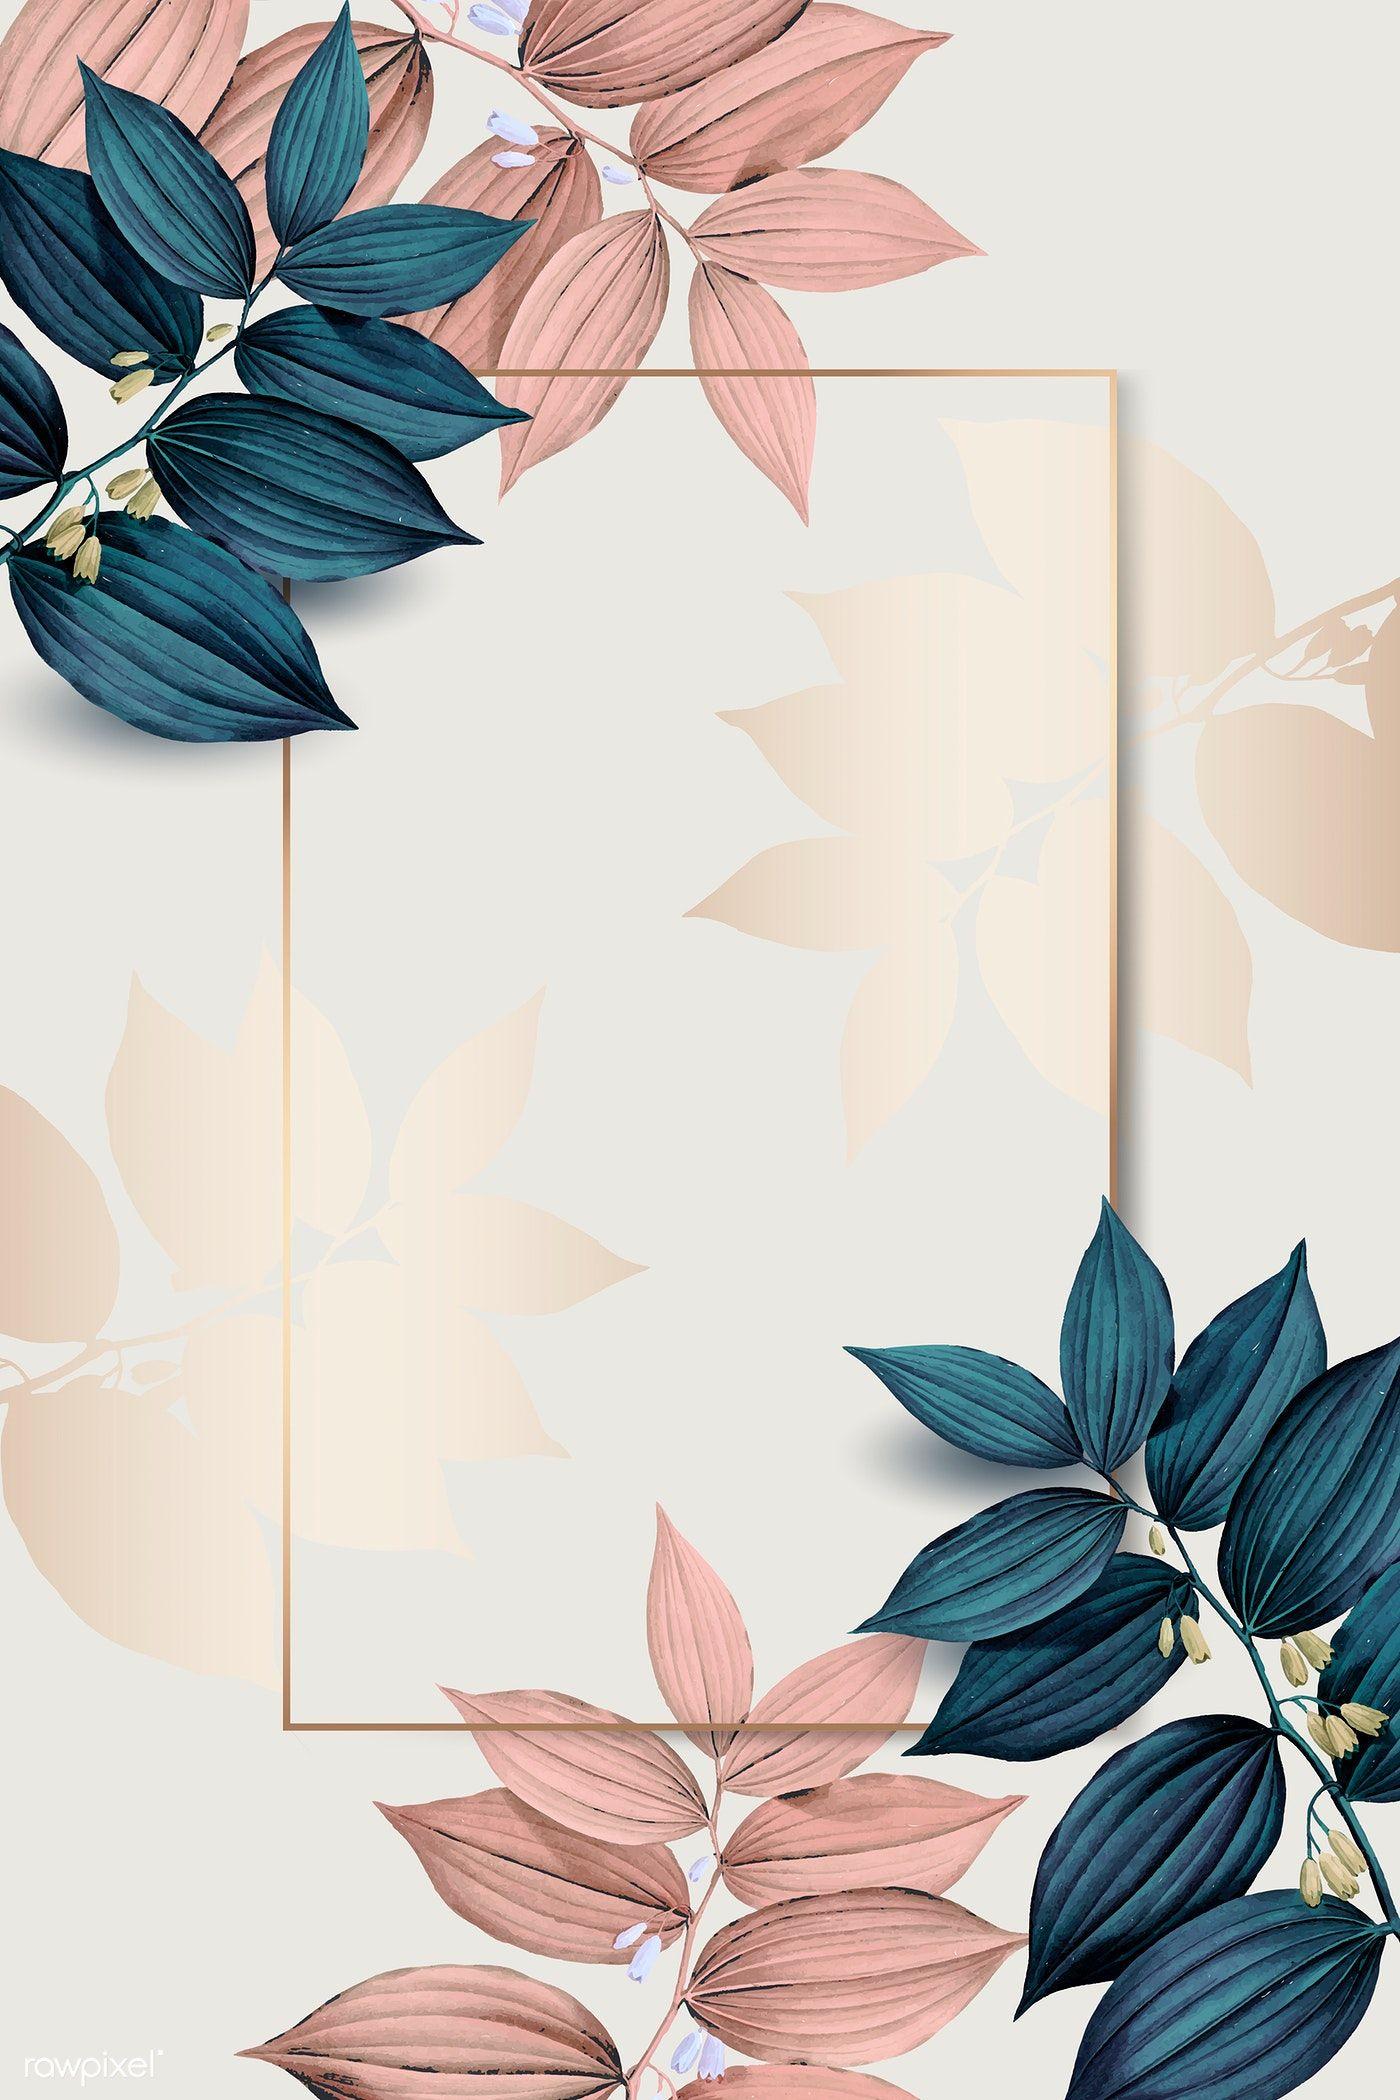 Download premium illustration of Rectangle gold frame on pink and blue